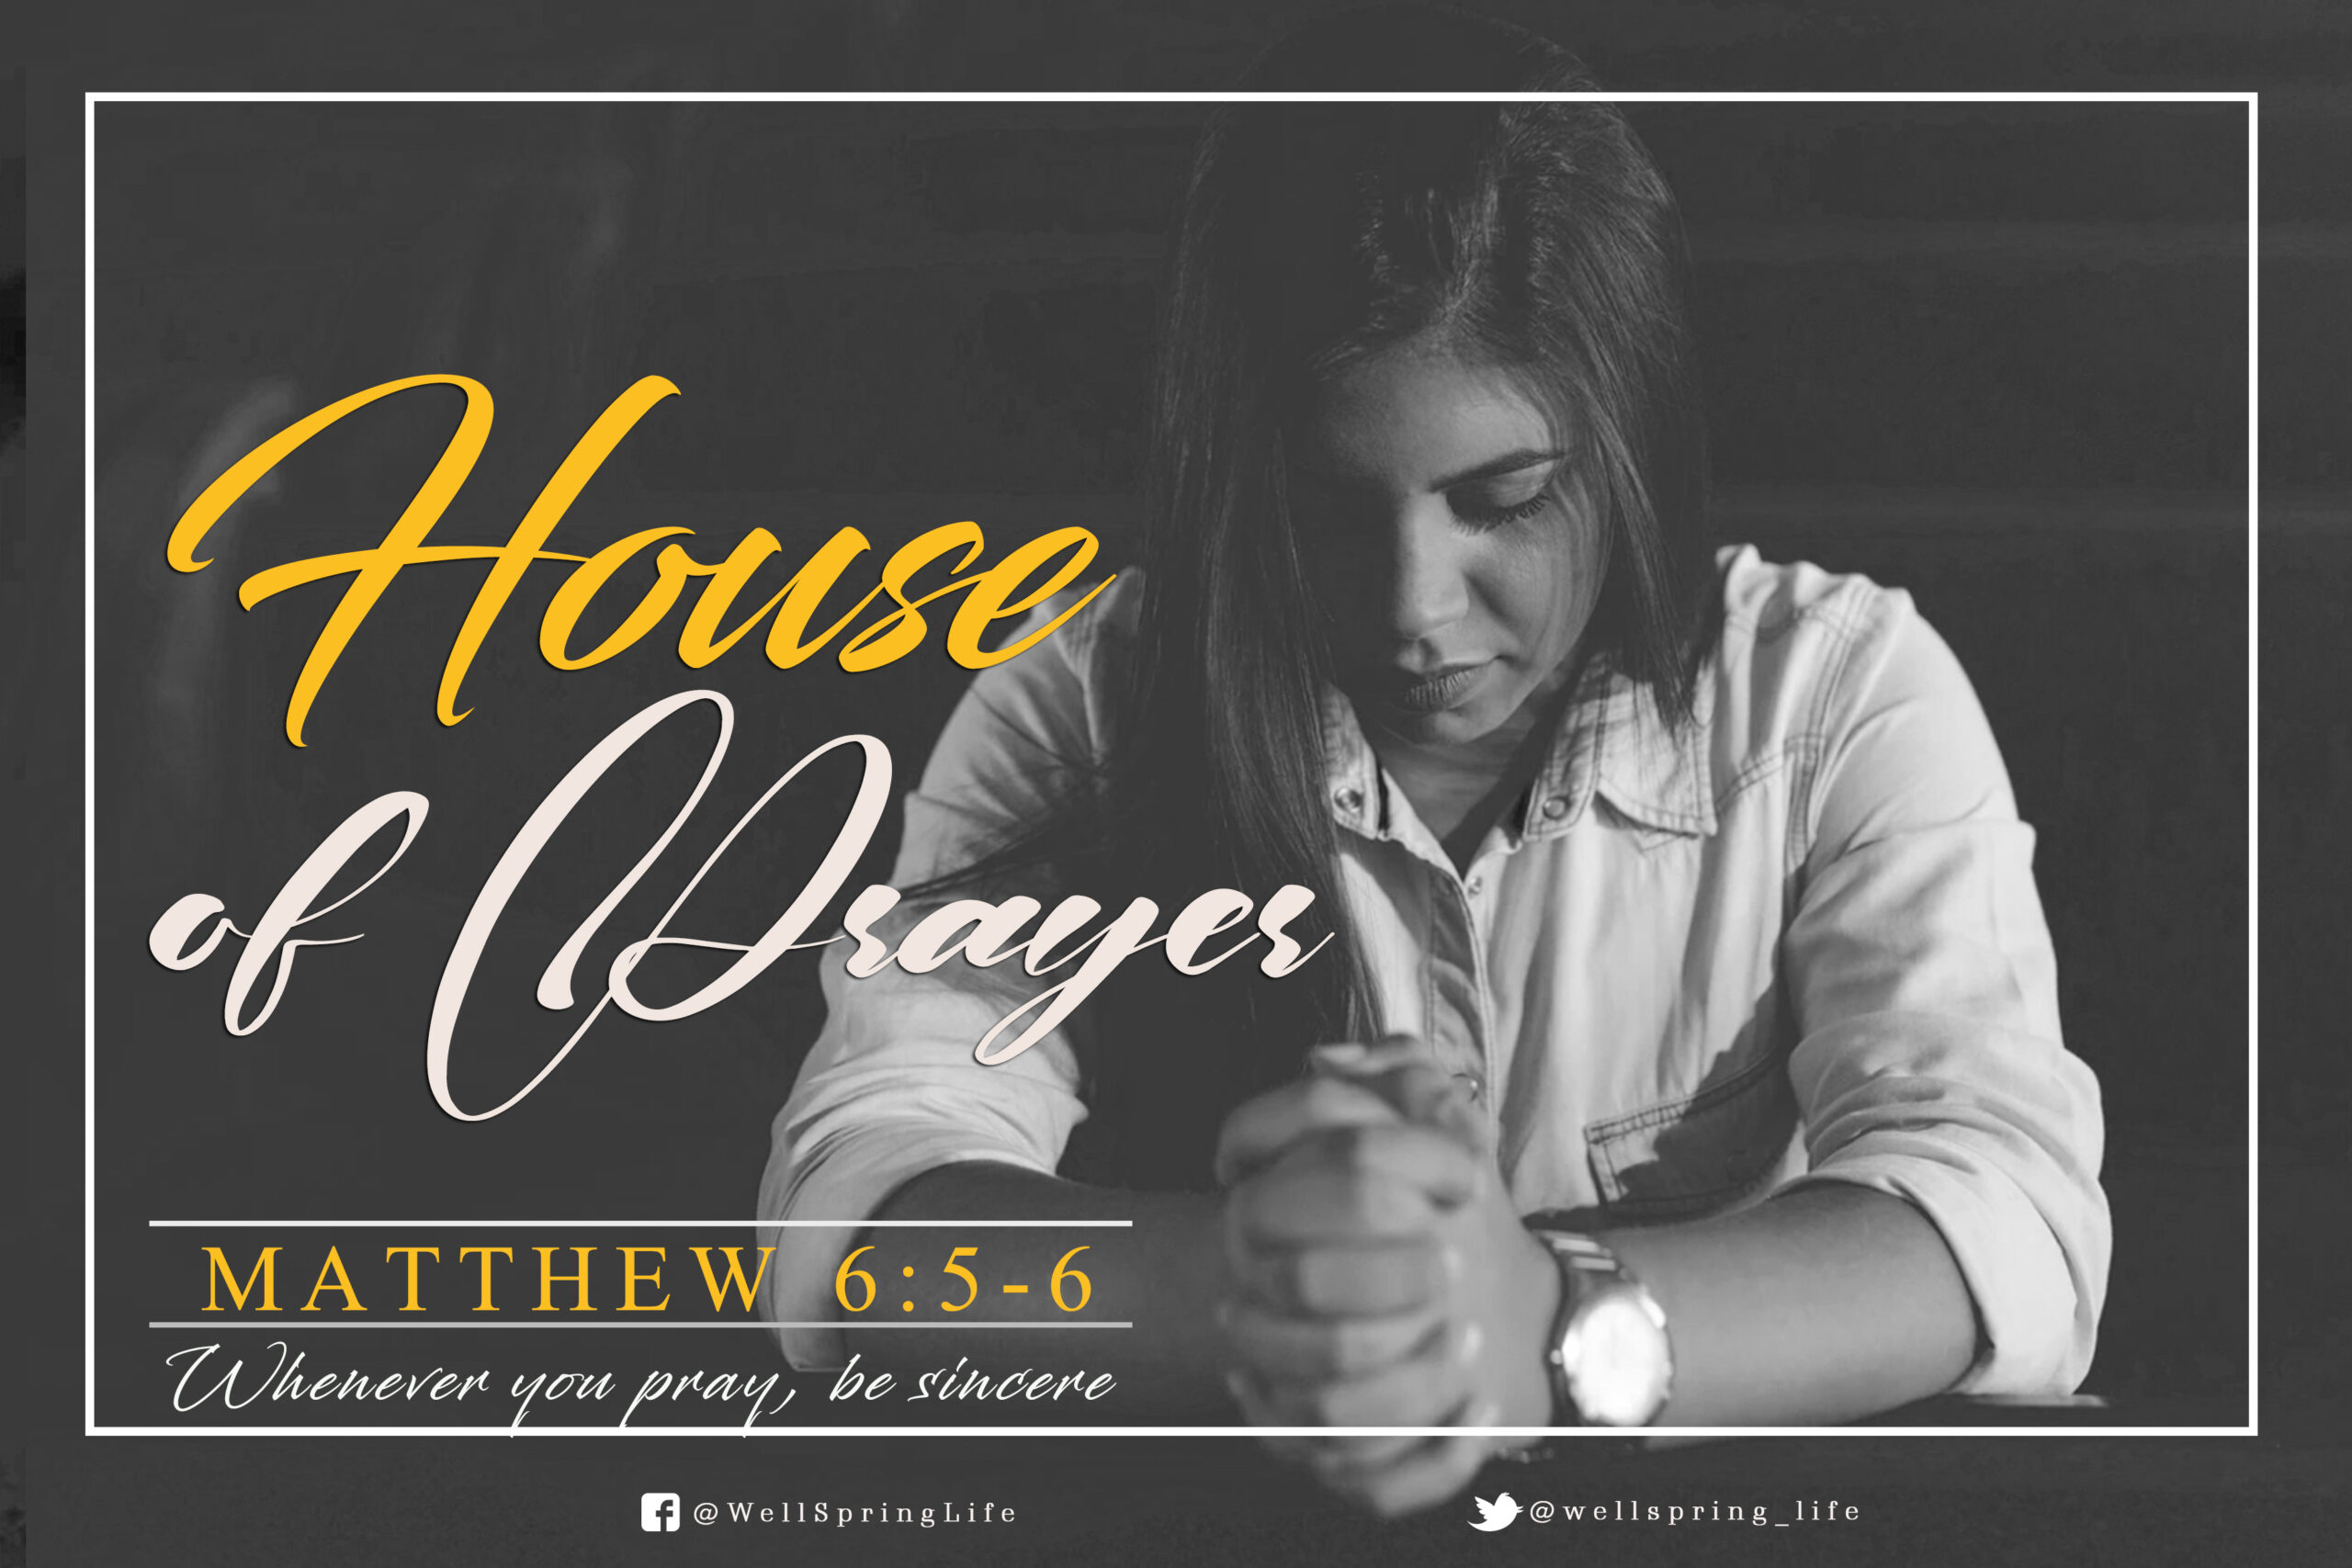 House of Prayer post thumbnail